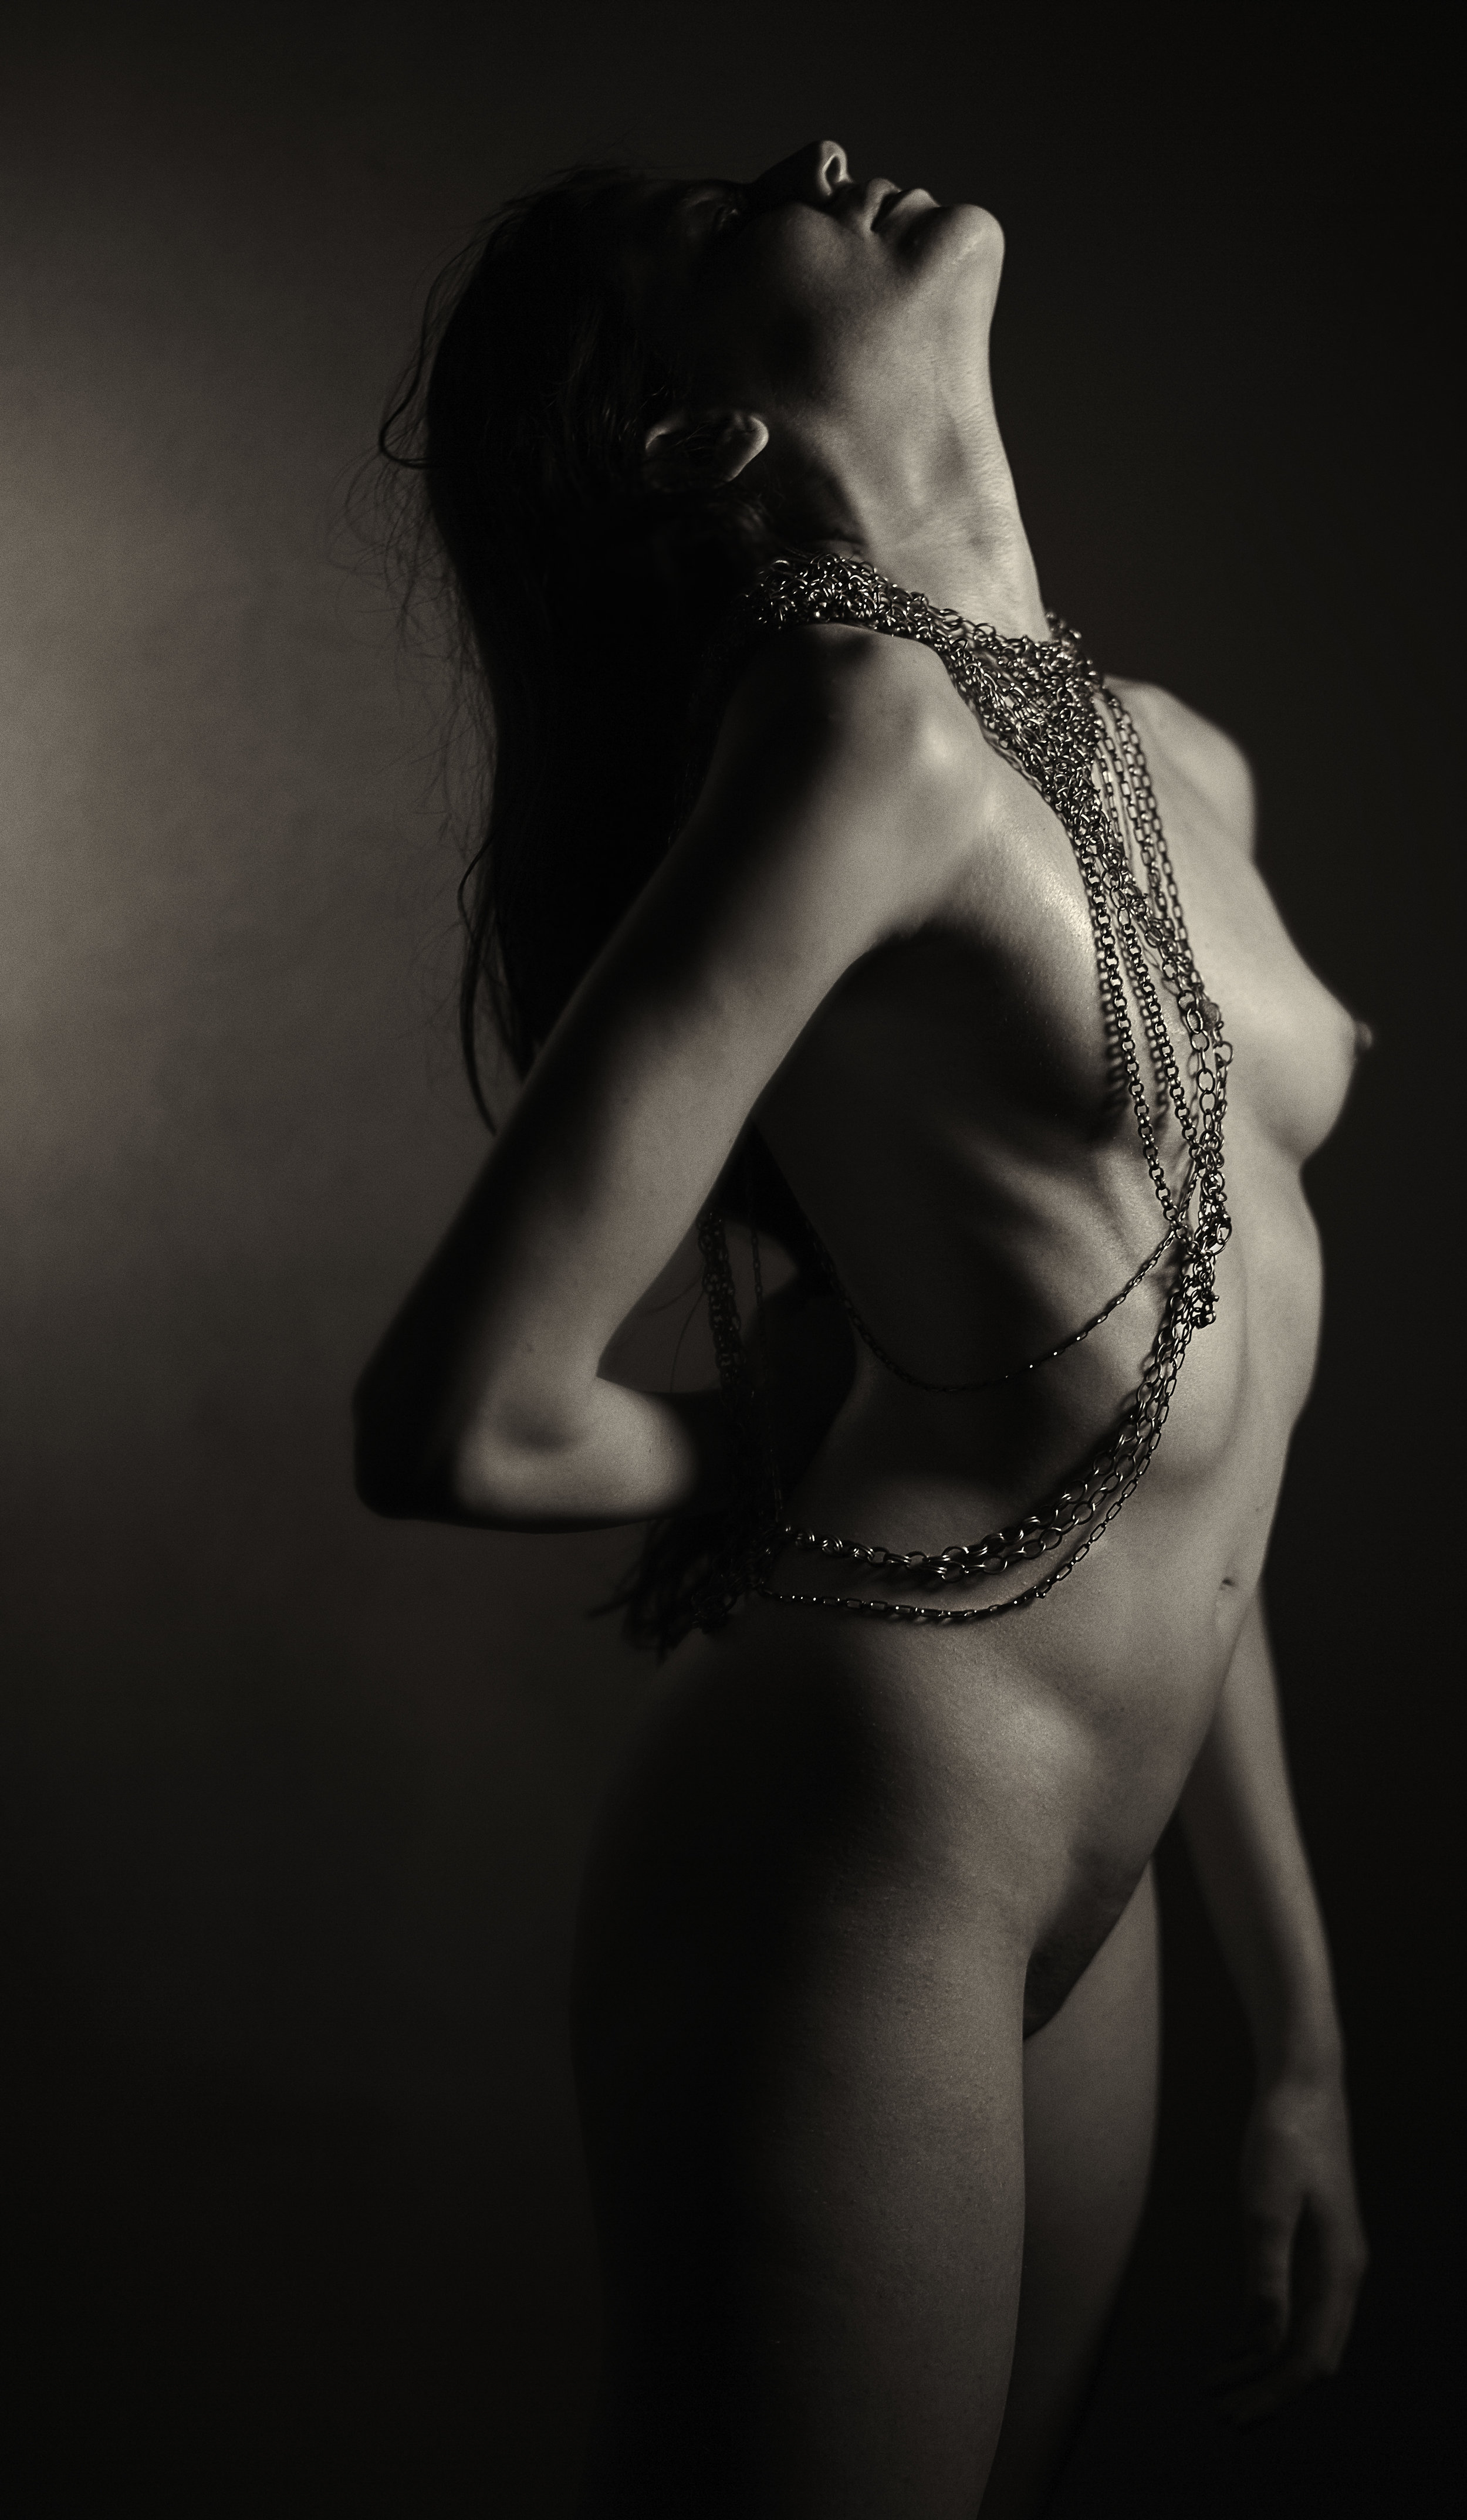 Fays_Chains_21966.jpg